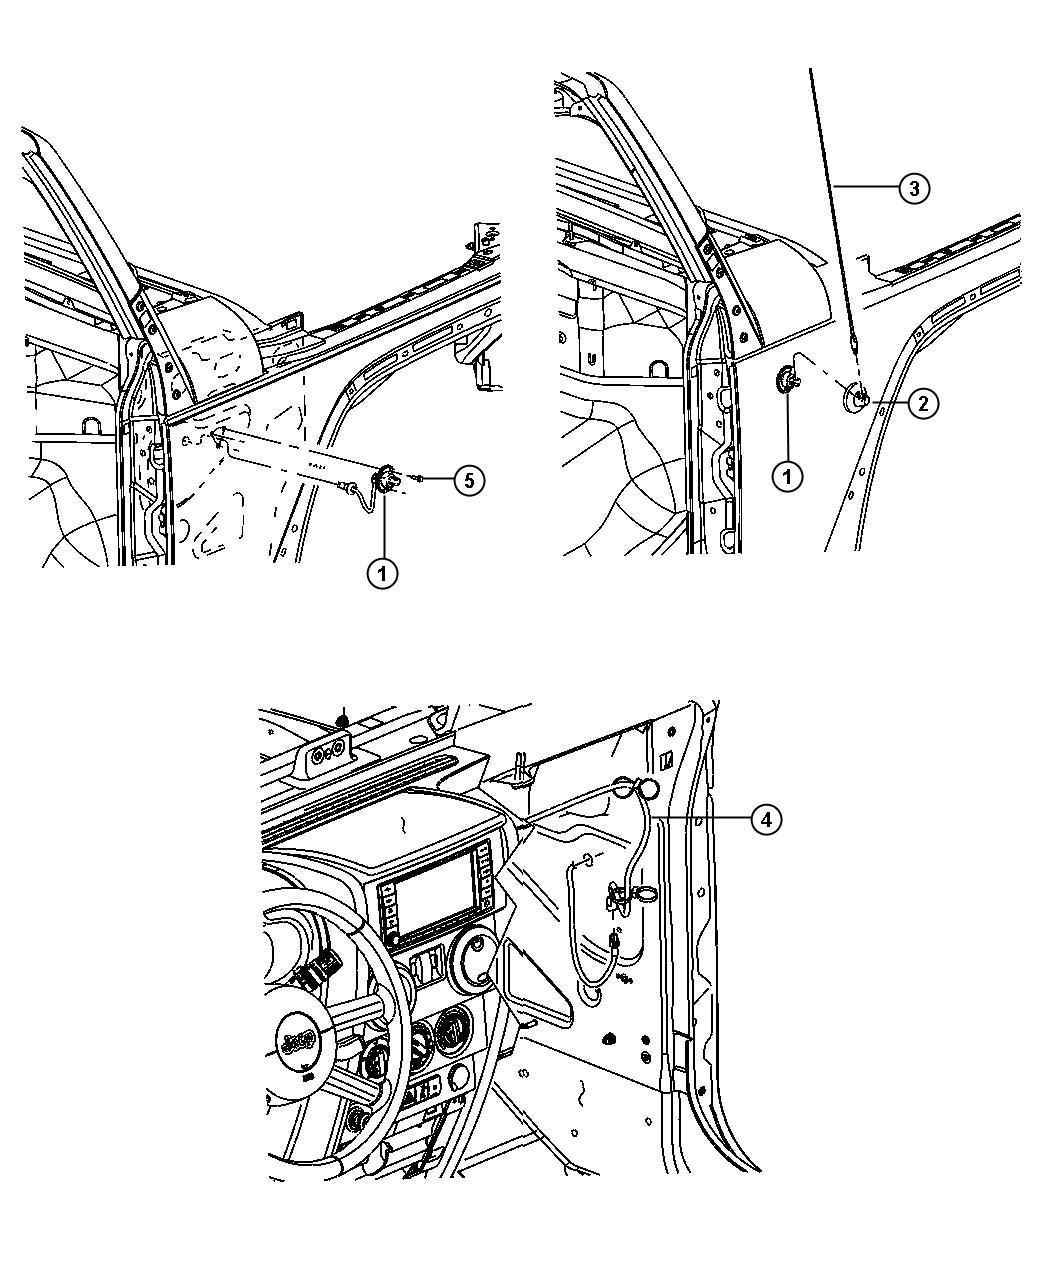 hyundai i20 2014 fuse box diagram